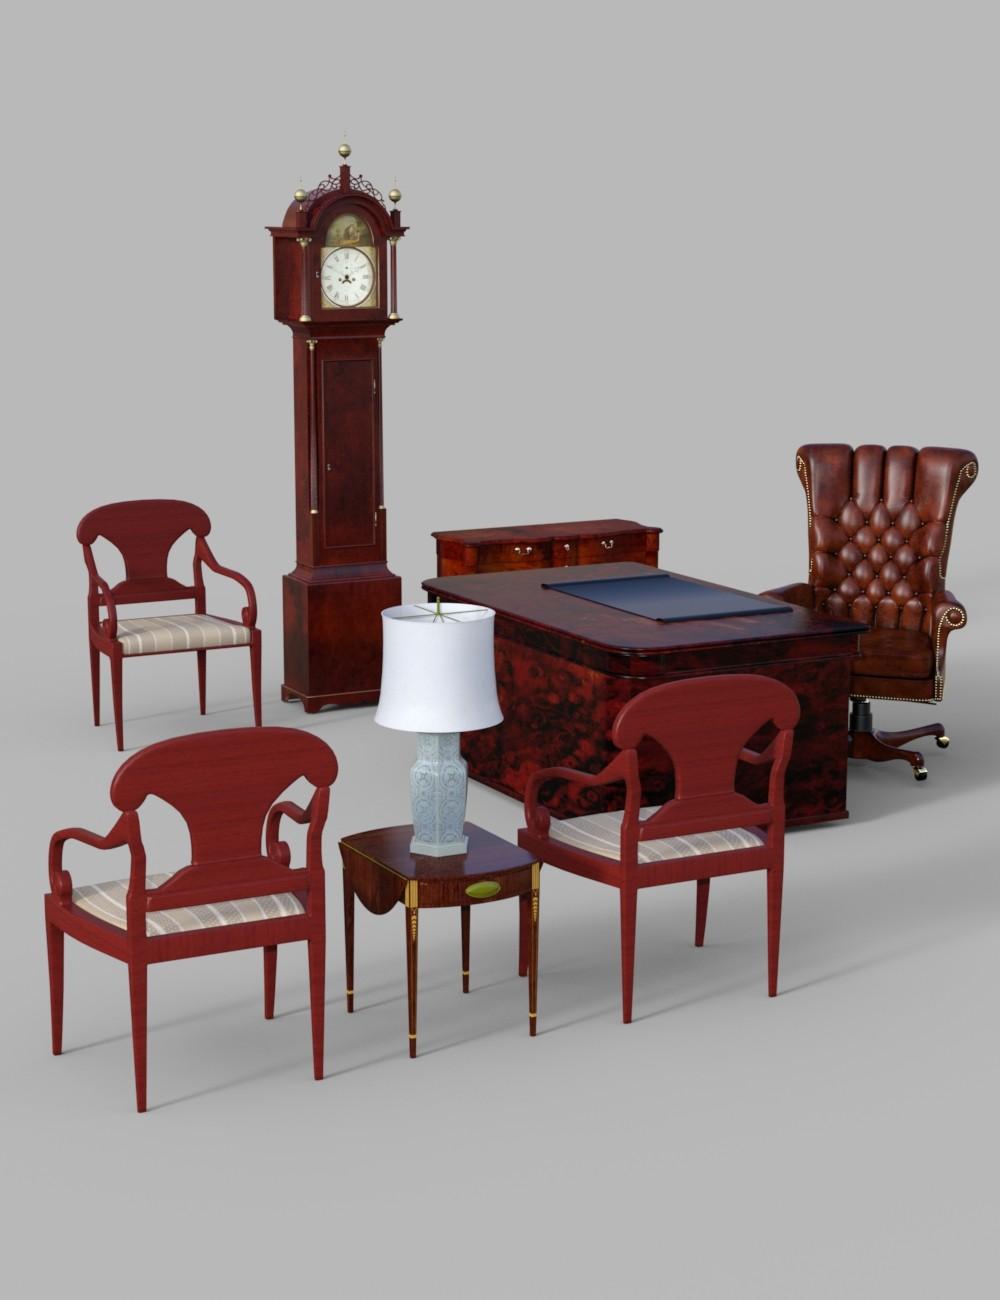 Download daz studio 3 for free daz 3d furniture set 1 for Classic furniture